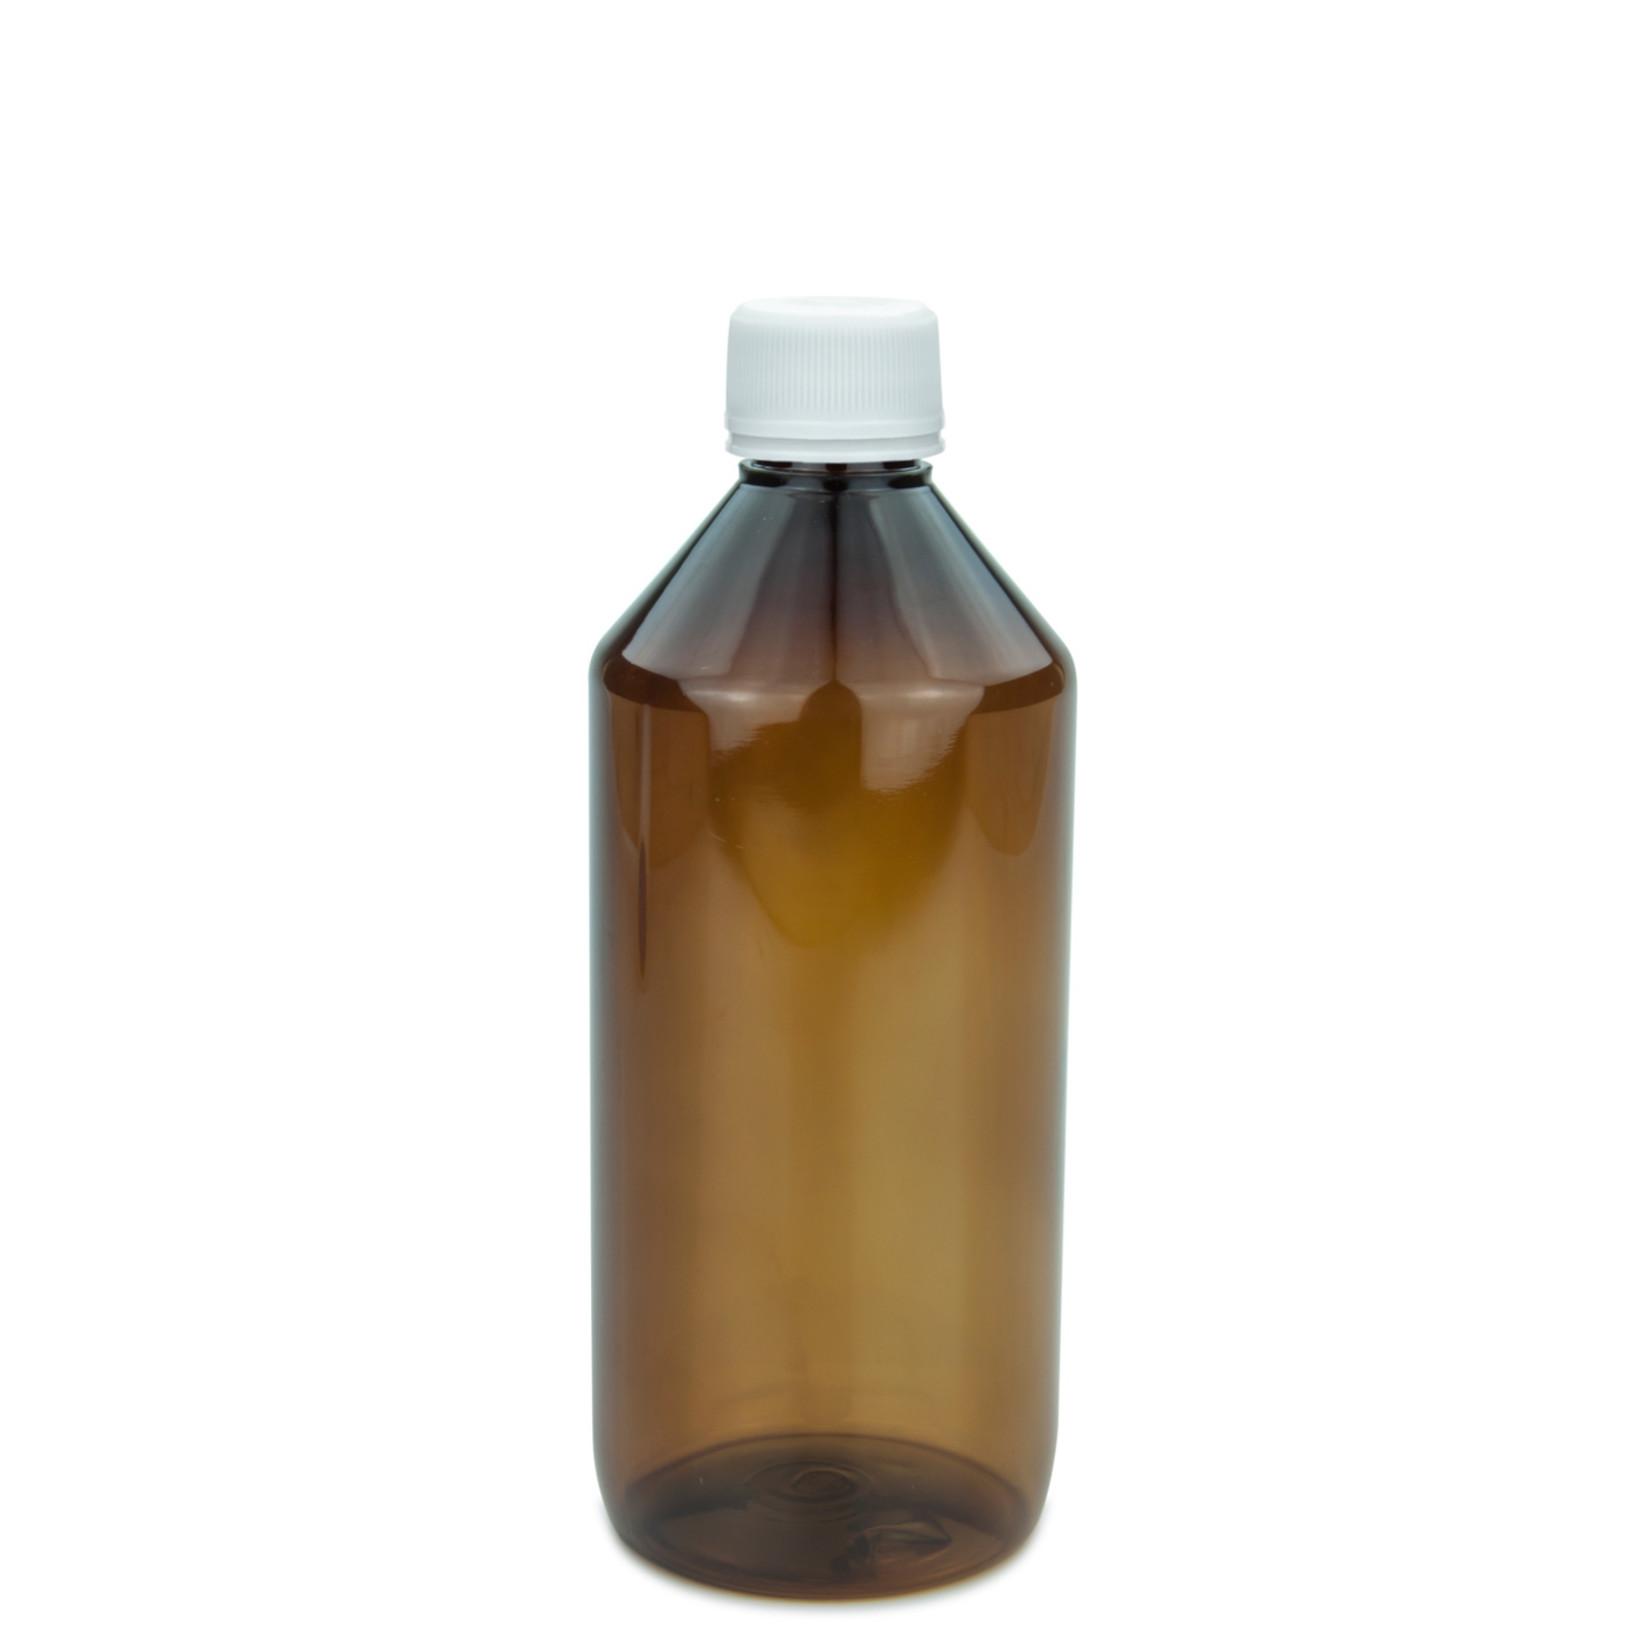 VPG 20/80 Nikotin-Salz Base 3-36 mg/ml 250-1000ml